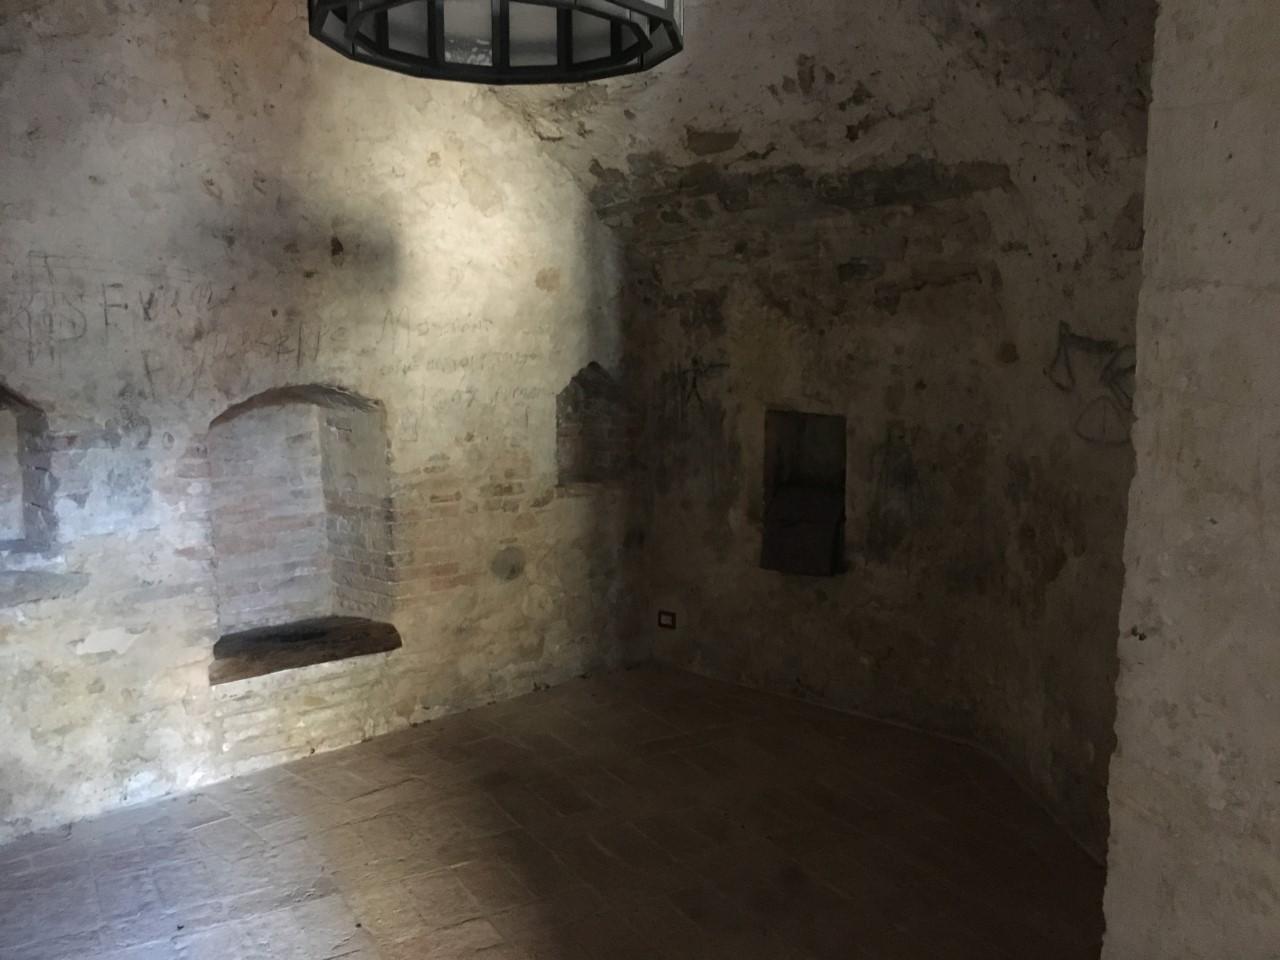 Prison cell, Piazza Fortebraccio, Montone, Umbria, August 2018